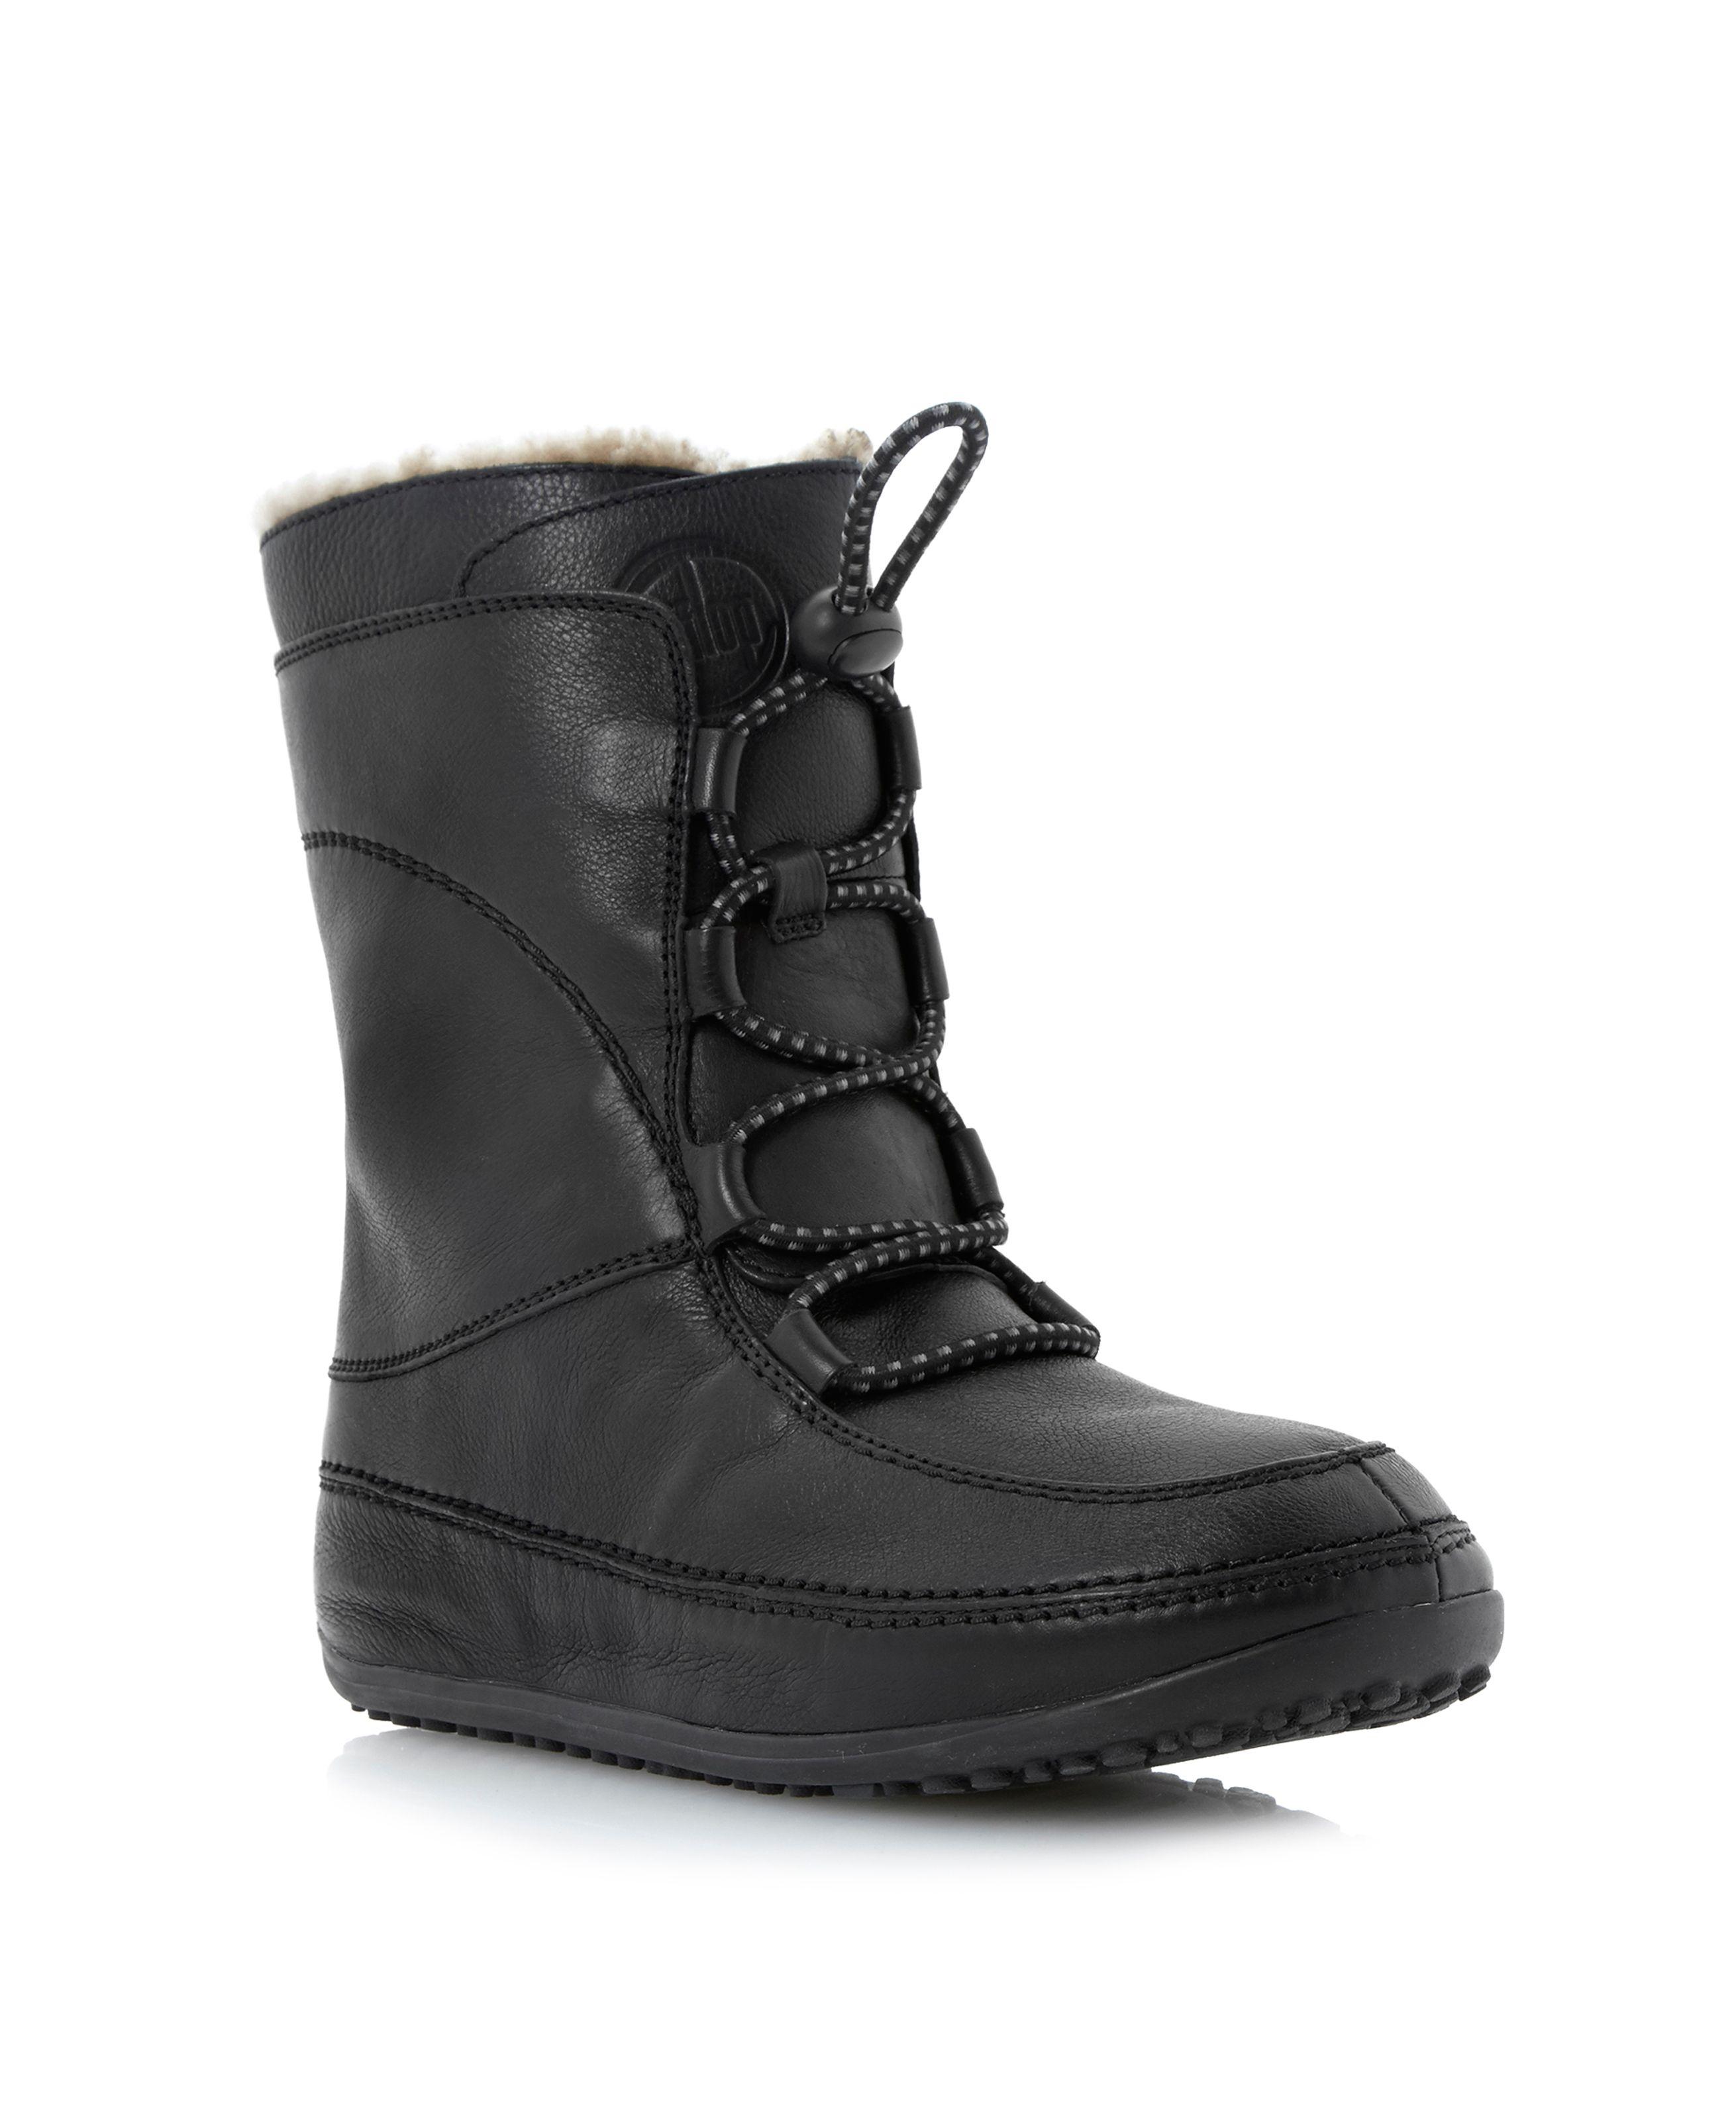 fitflop mukluk boots sale uk avanti house school. Black Bedroom Furniture Sets. Home Design Ideas